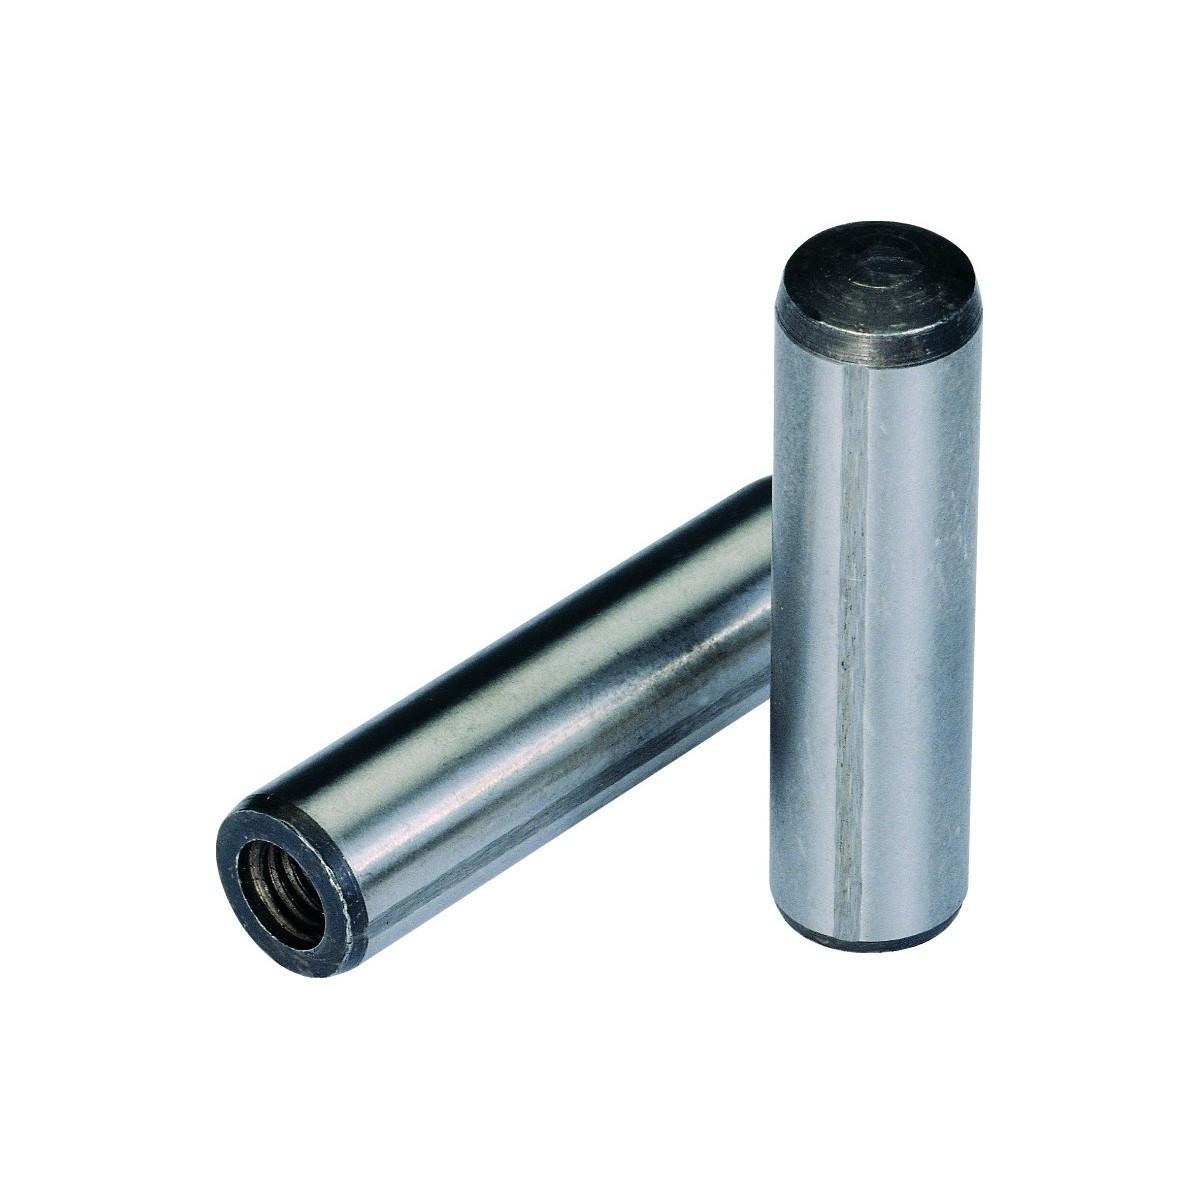 Штифт цилиндрический MMG  DIN 7979D M8 х 100 Класс 10.9 (Фосфат) 1 шт